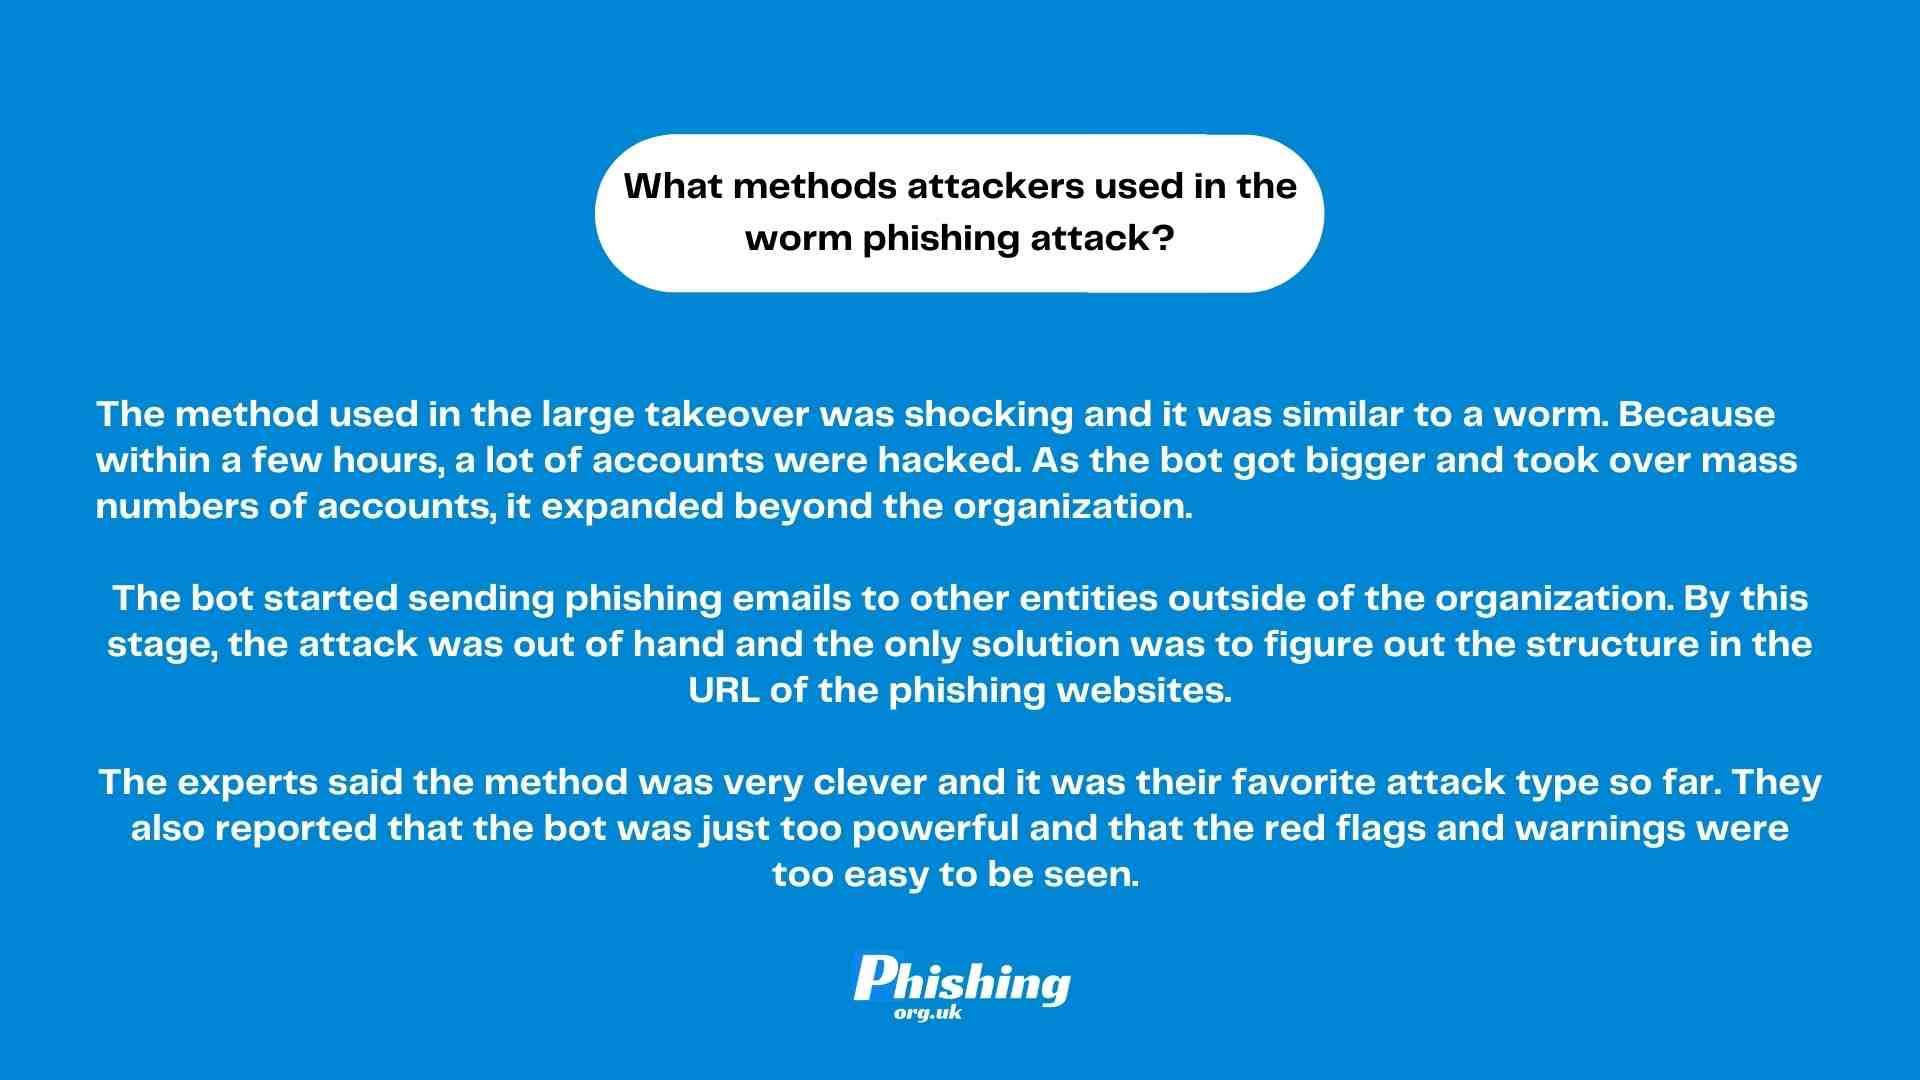 Worm phishing attacks change the scope of cyber attacks